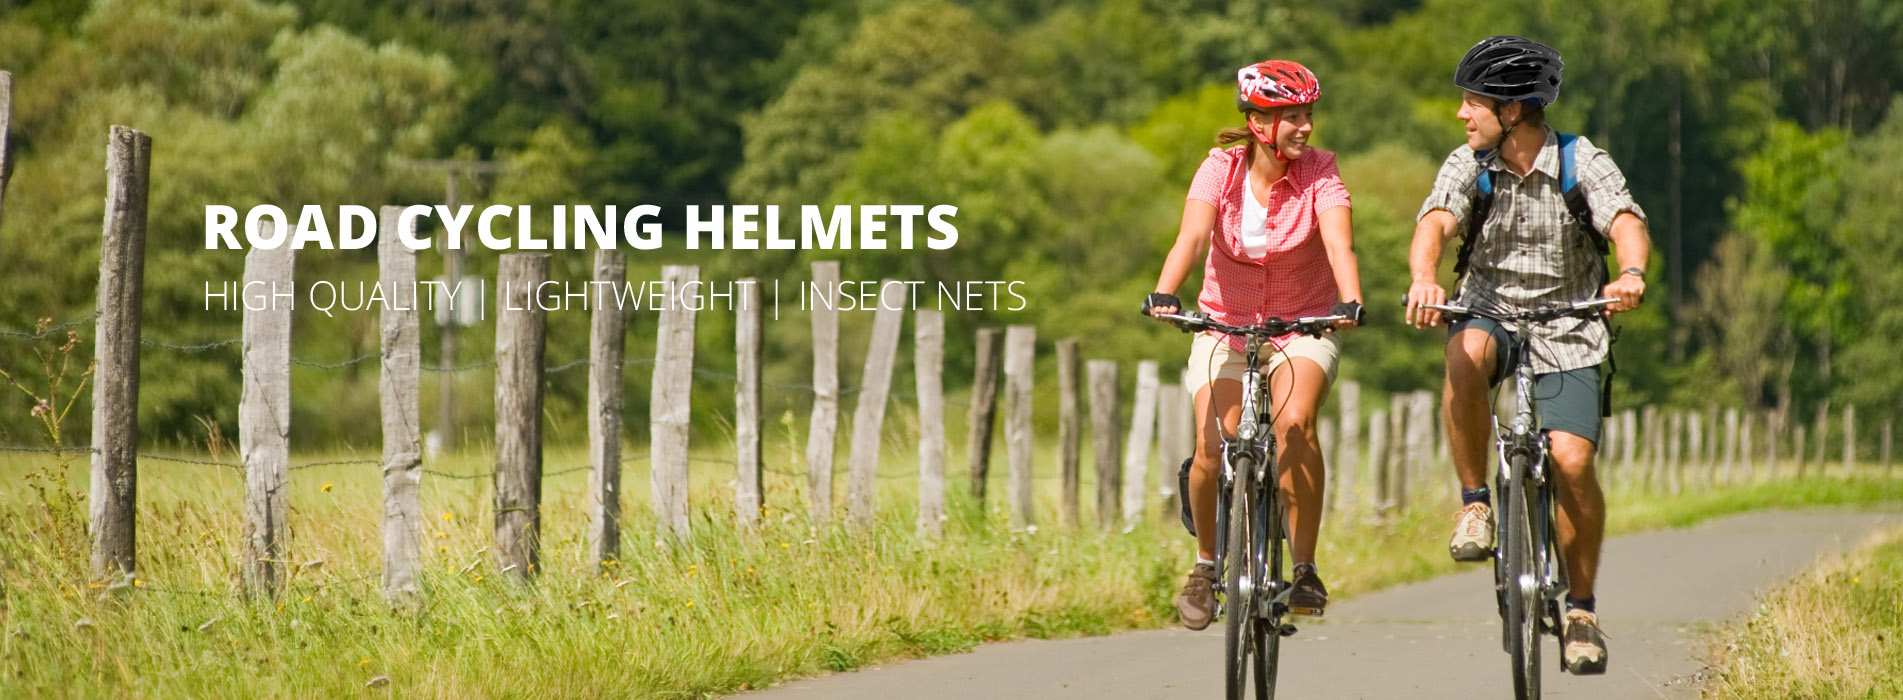 road cycling helmet r91